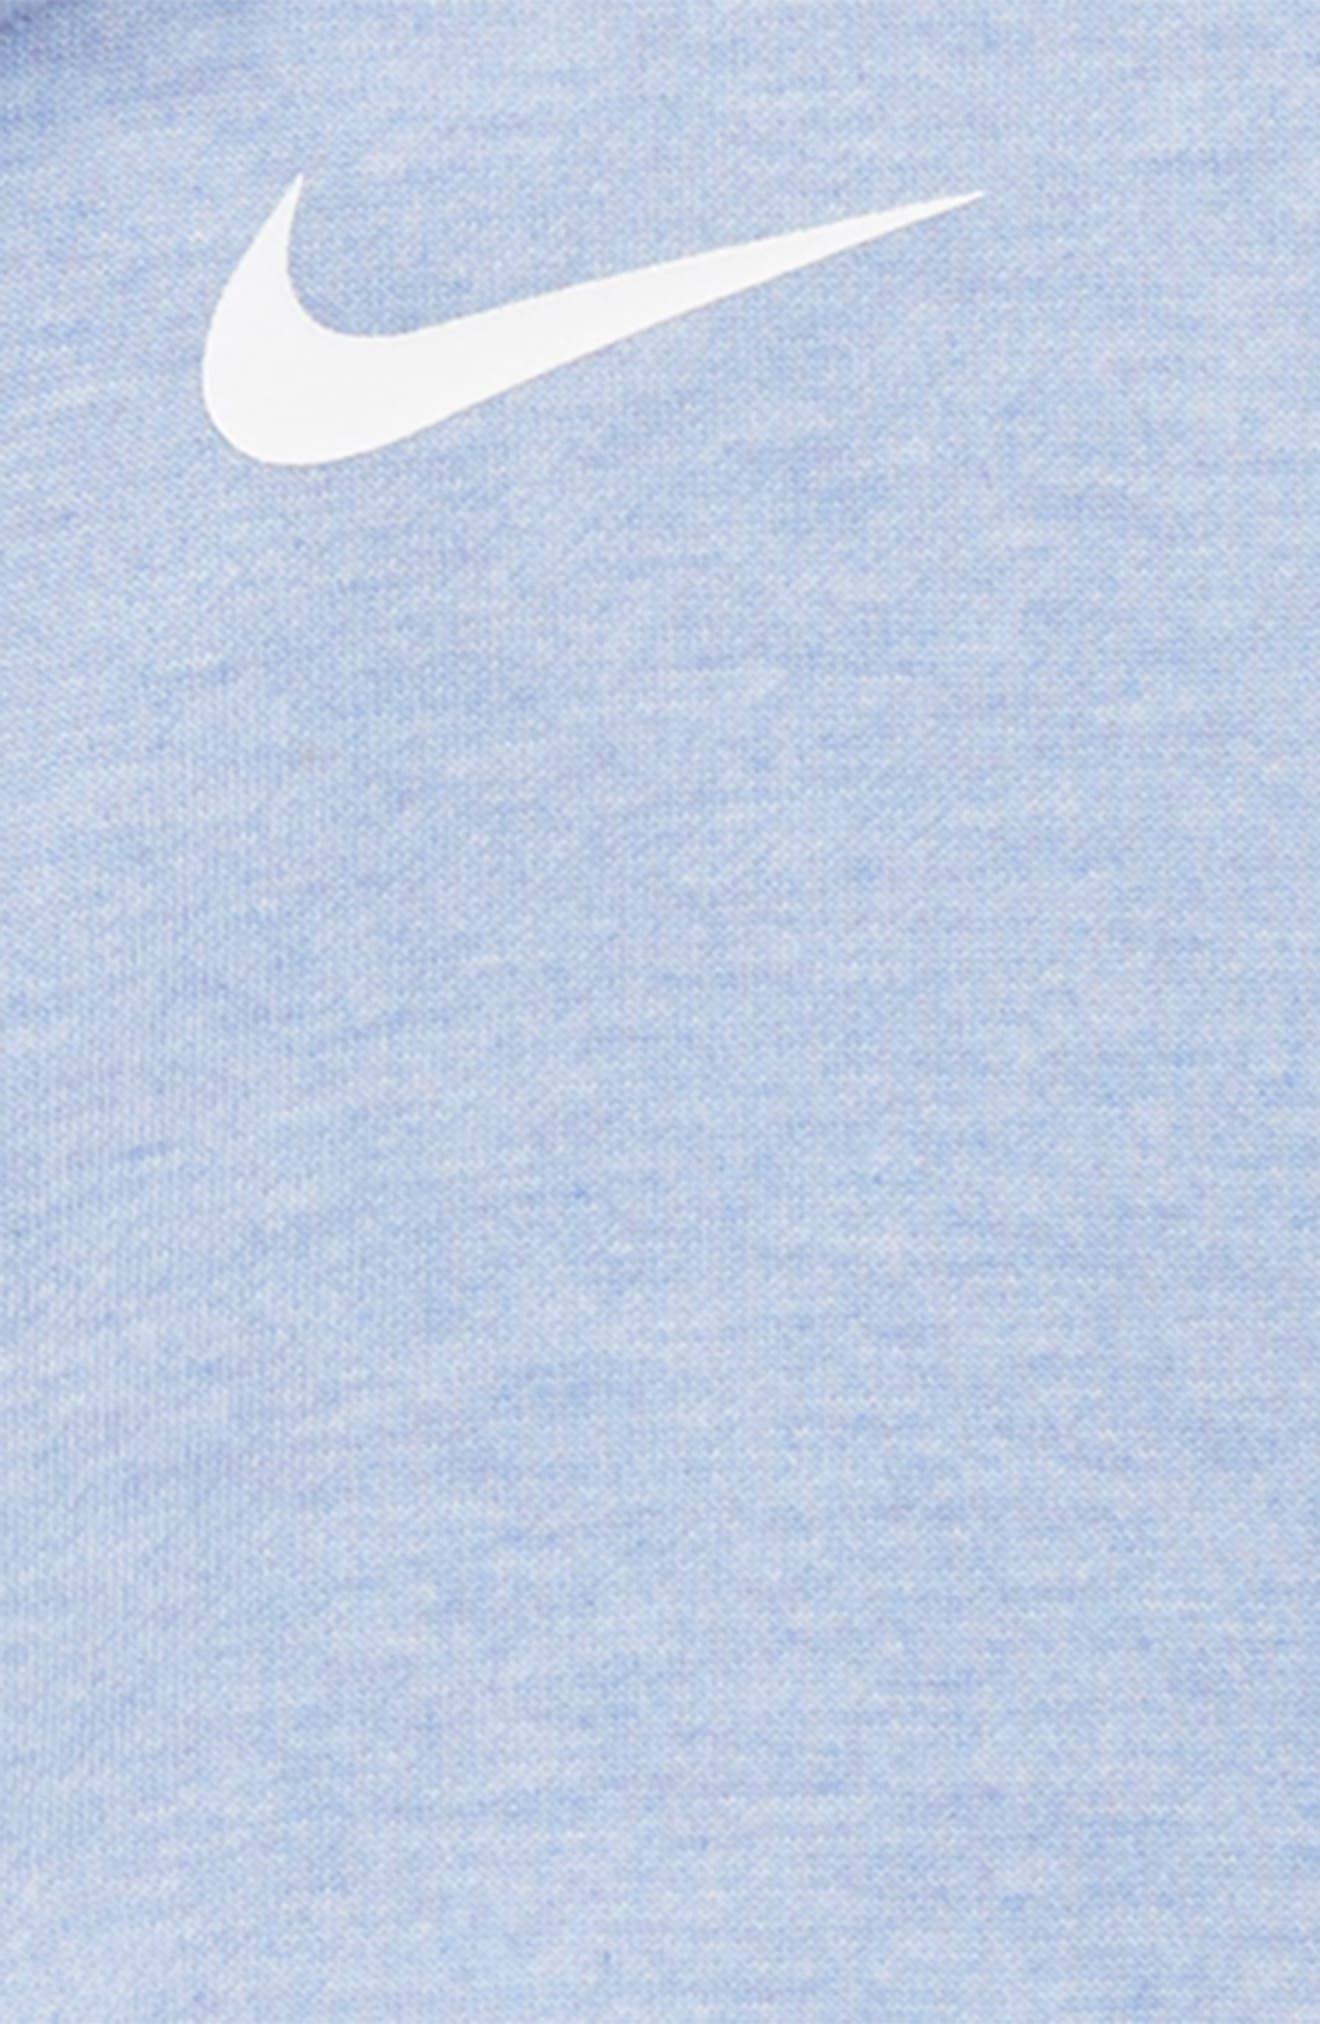 FZ Core Studio Dry Zip Hoodie,                             Alternate thumbnail 2, color,                             ROYAL PULSE/ HEATHER/ WHITE